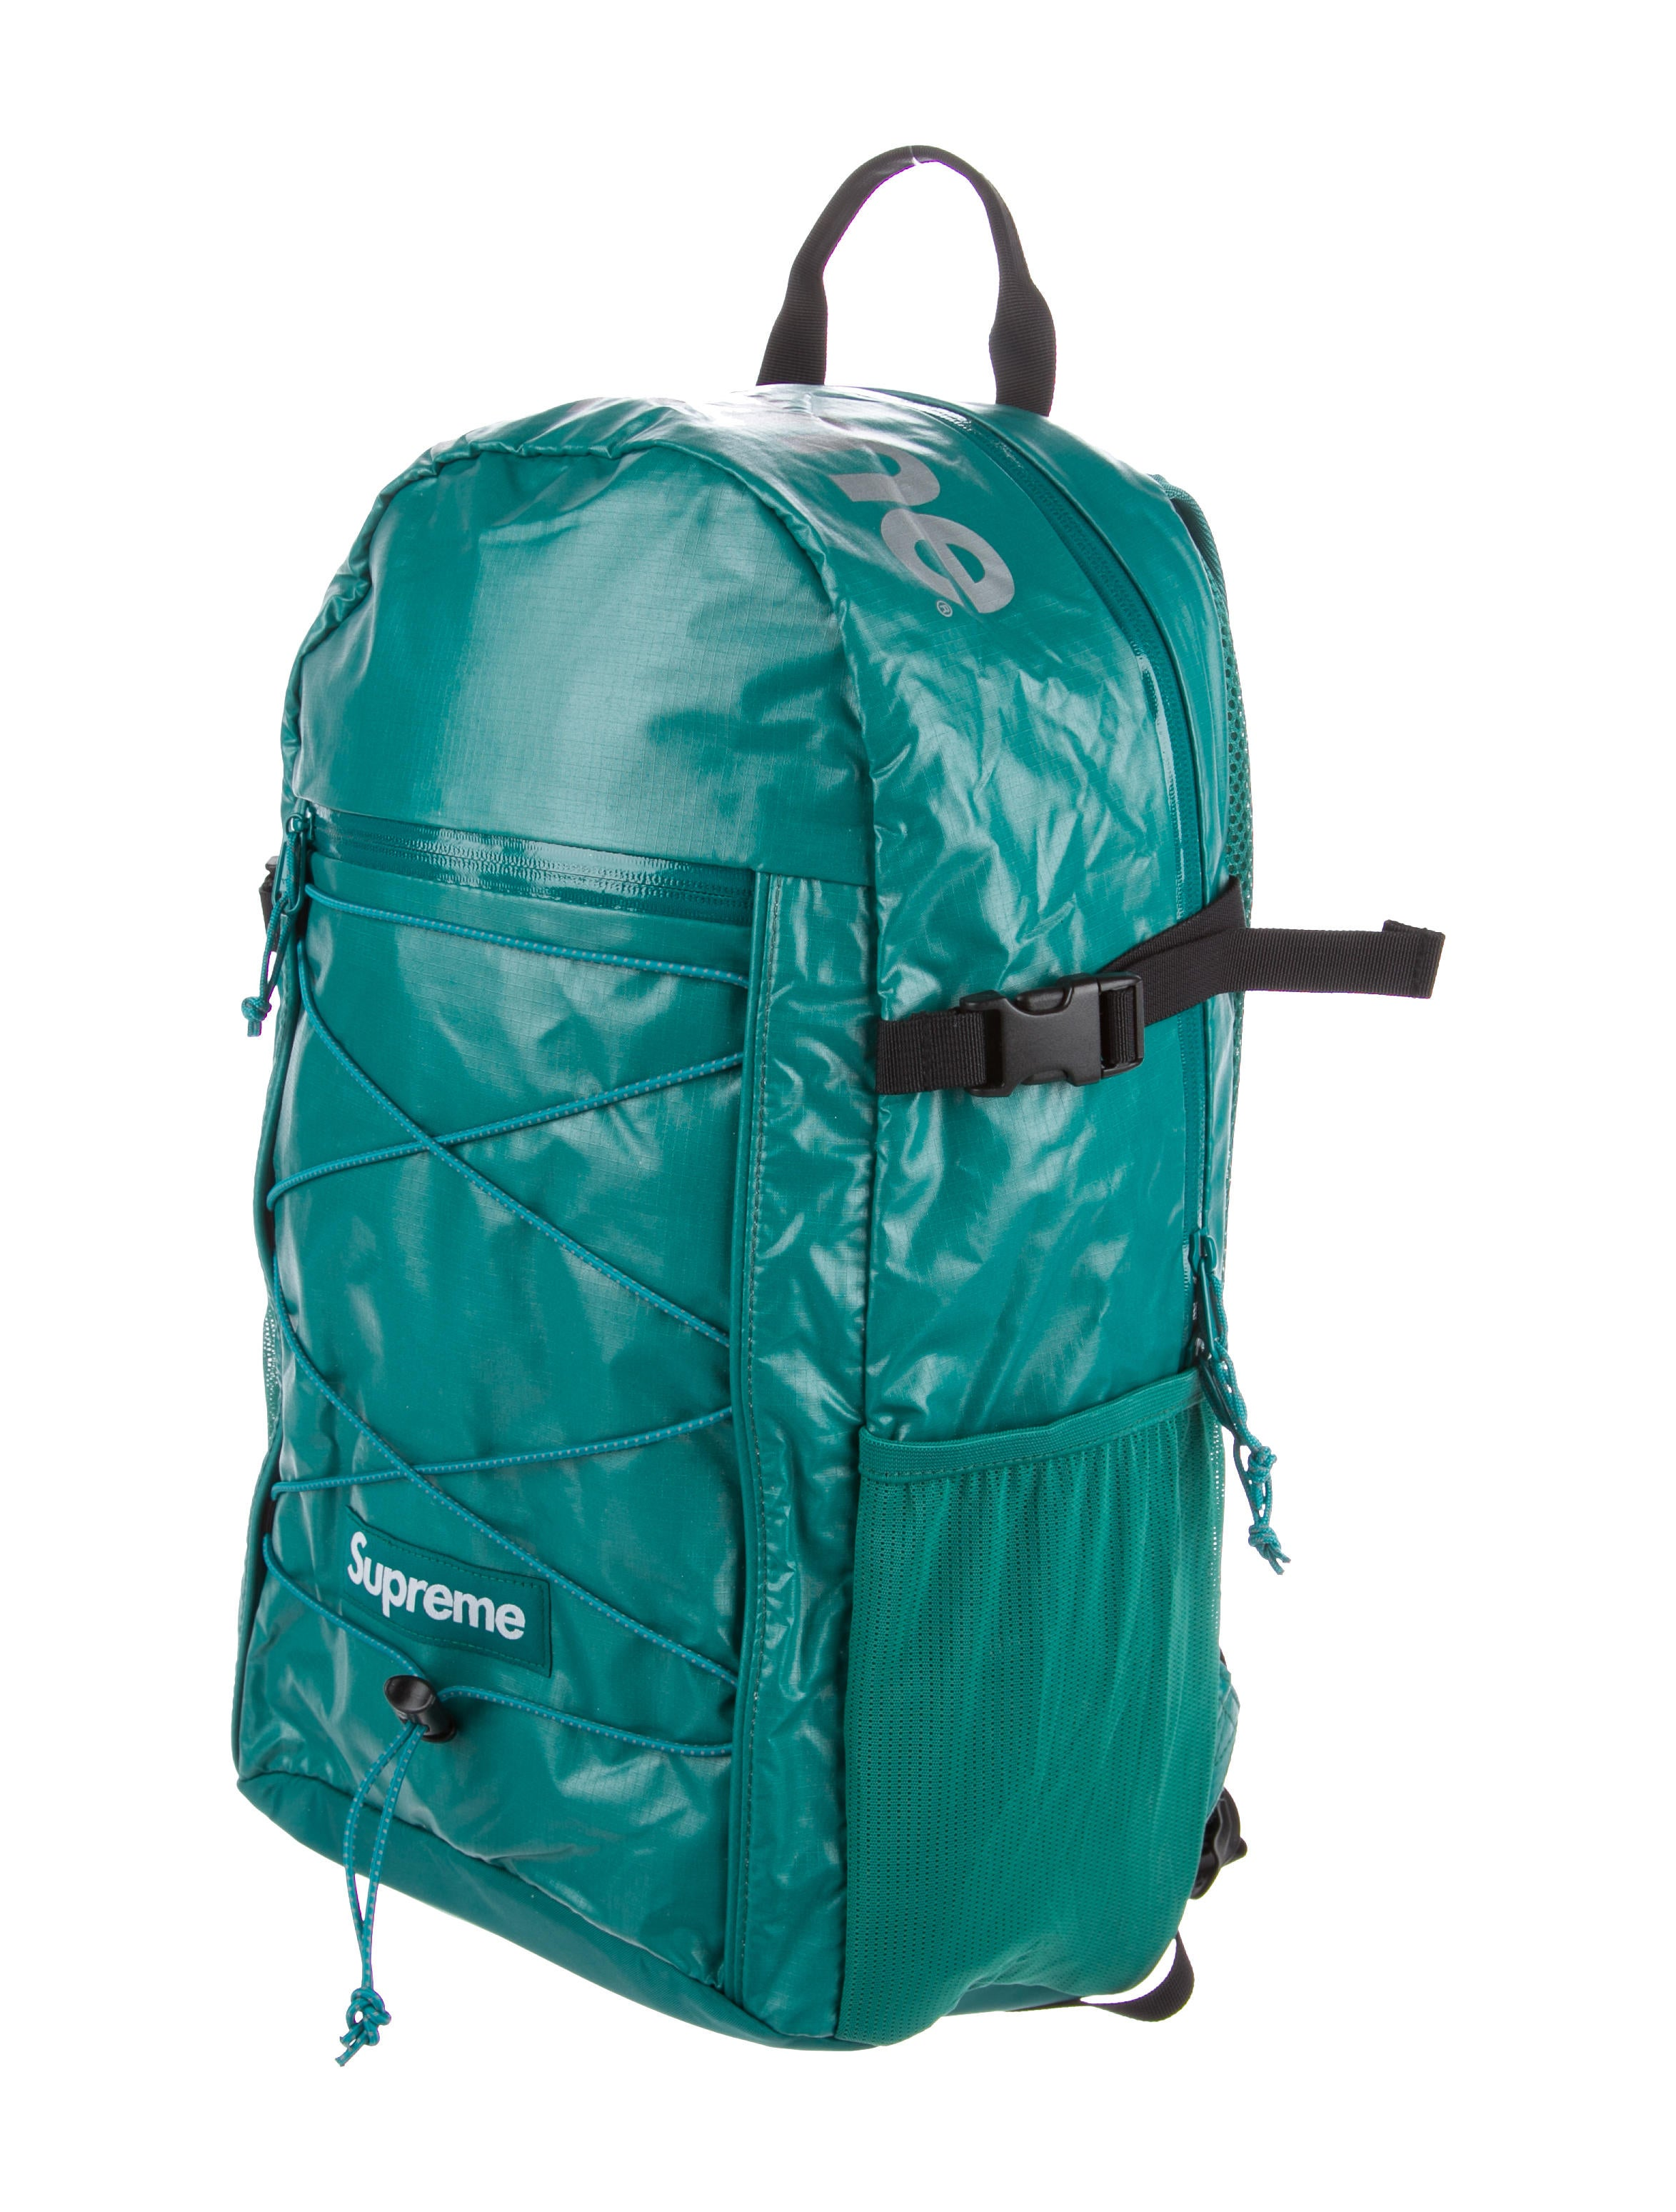 86b9544978 Teal Backpack Supreme- Fenix Toulouse Handball